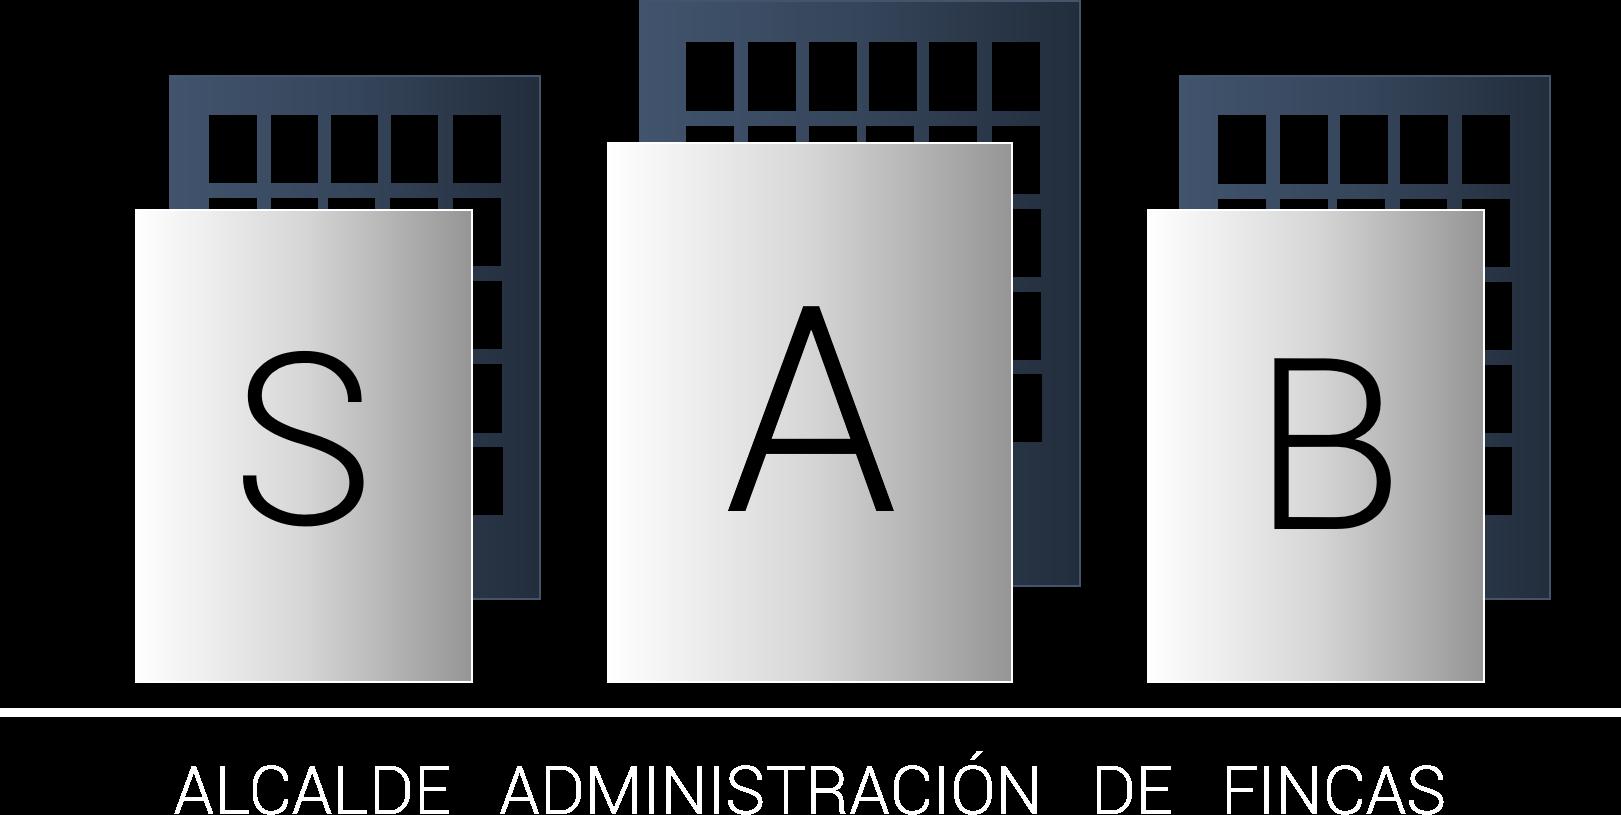 SAB ADMINISTRACION DE FINCAS